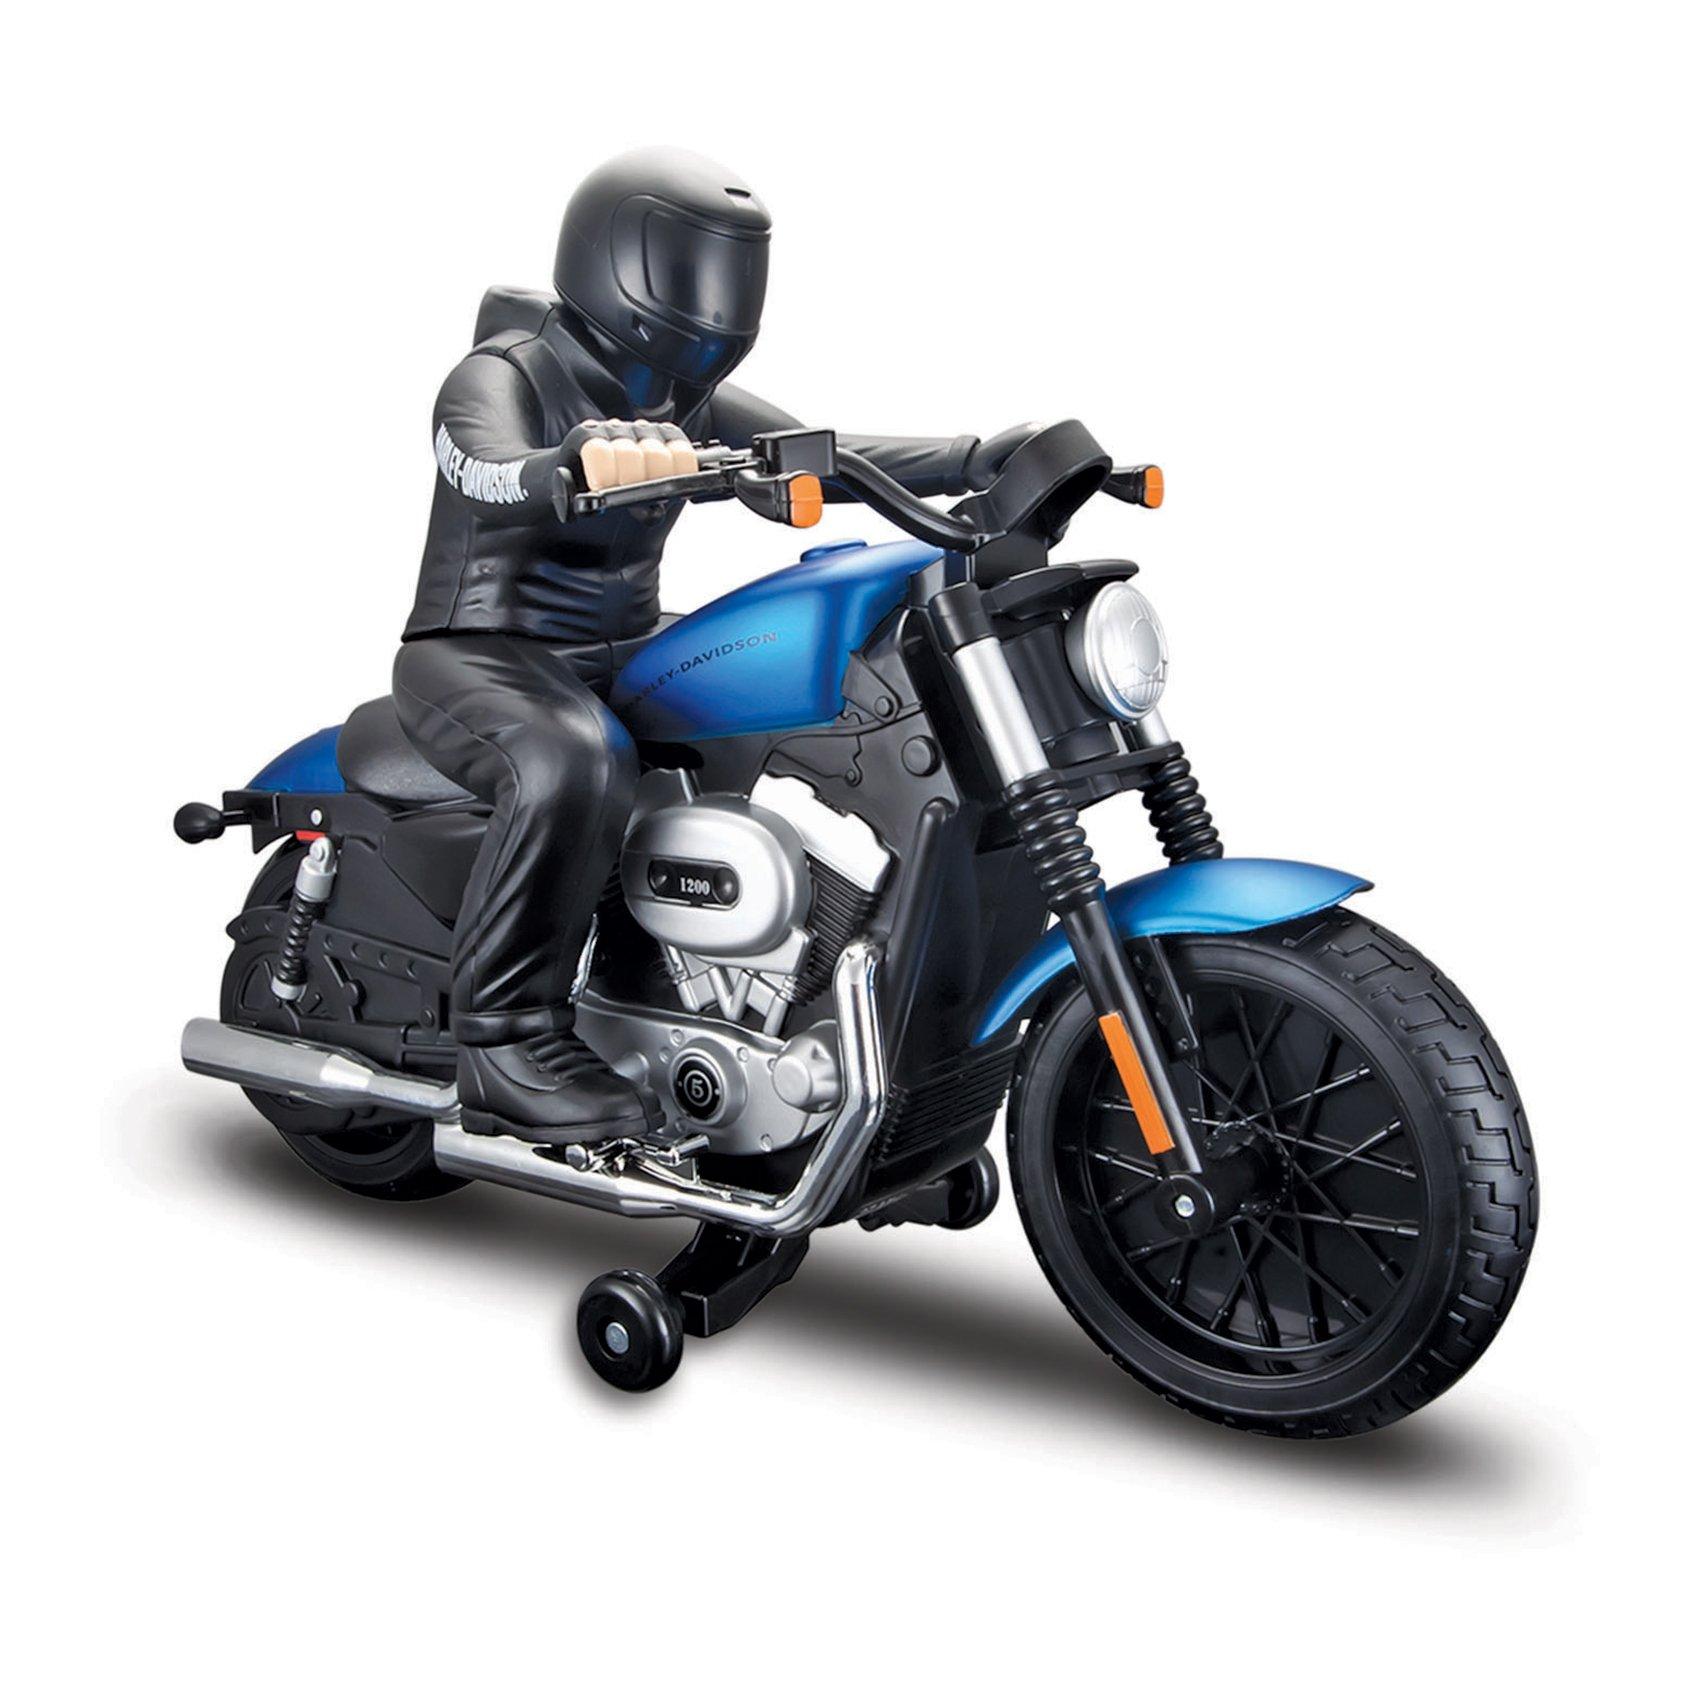 Motocicleta cu telecomanda Maisto Harley-Davidson Nightster XL 1200N-Albastru